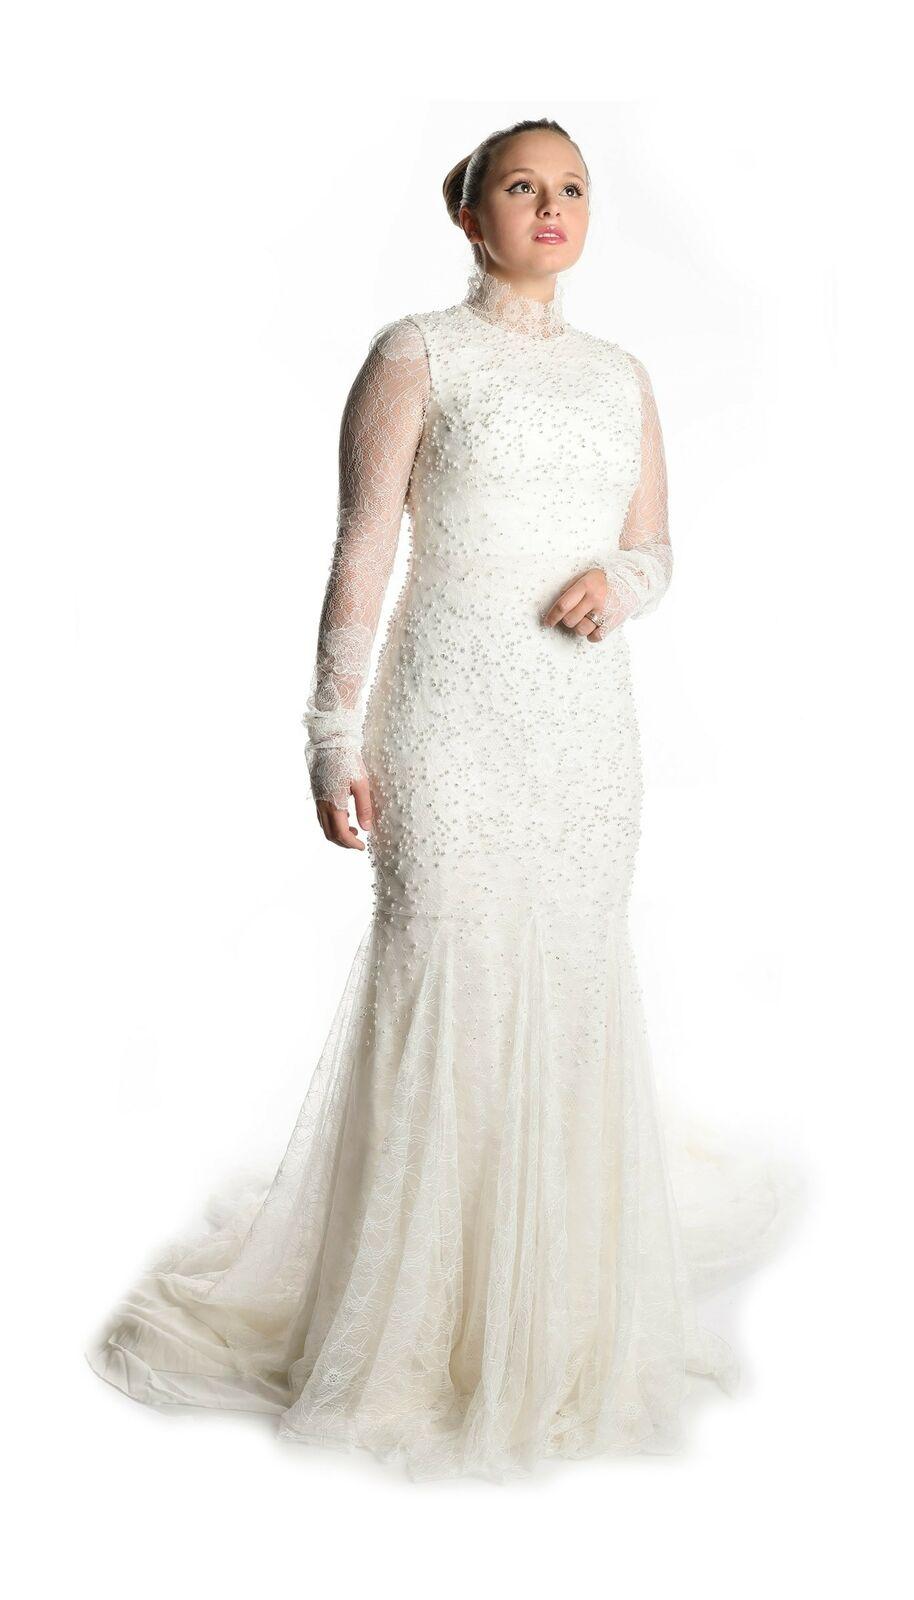 Vera Wang The Waverly Wedding dress Lace Silhouette embellished beads size US 8